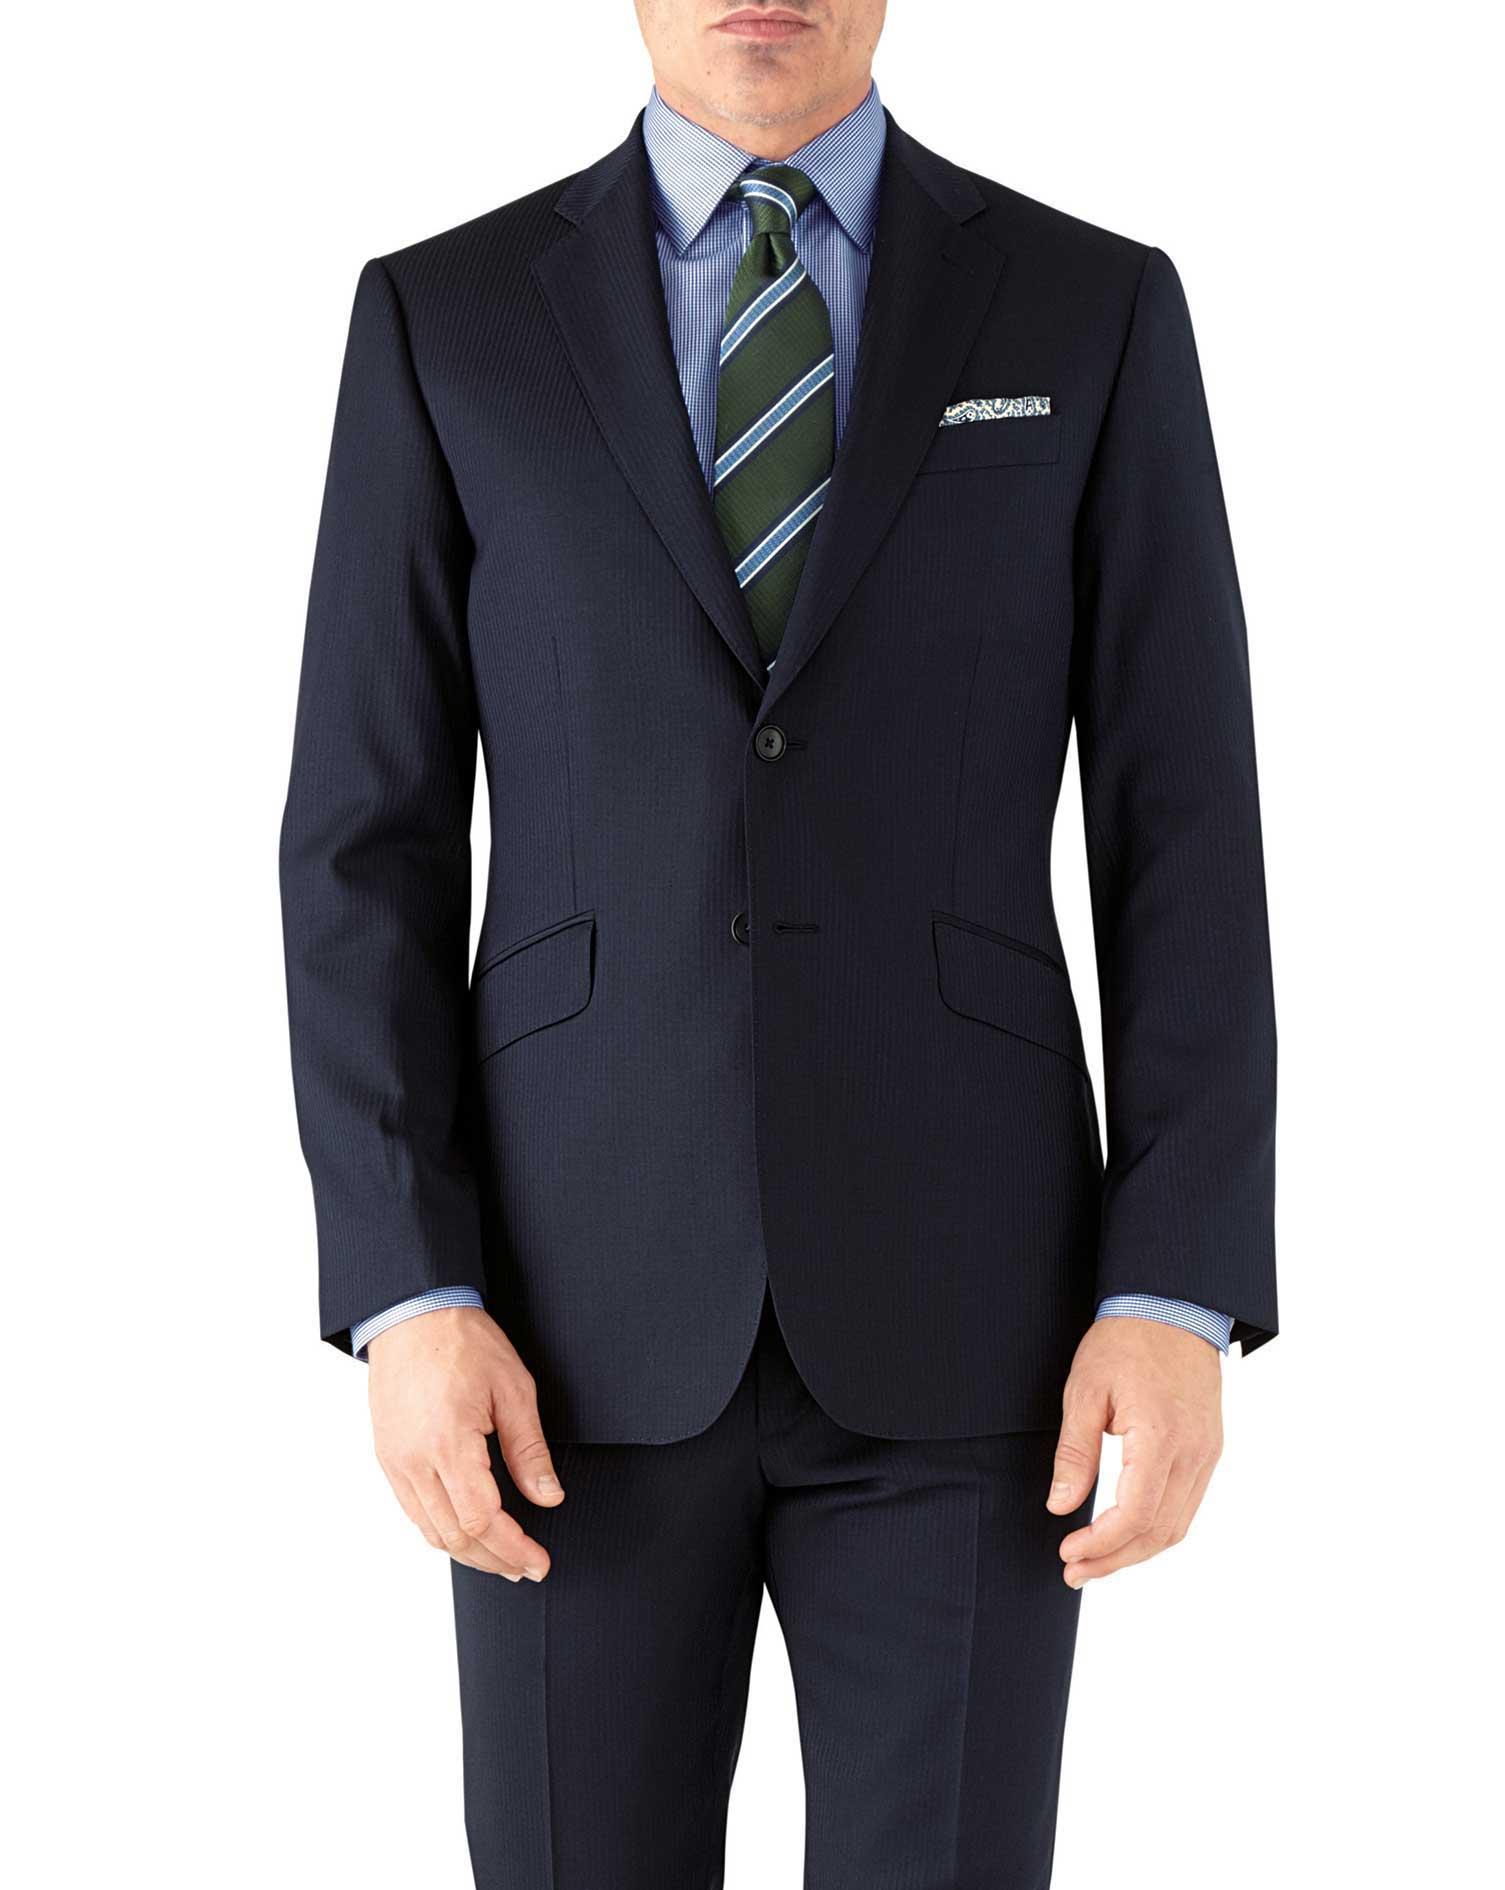 Navy Herringbone Classic Fit Italian Suit Wool Jacket Size 44 Long by Charles Tyrwhitt